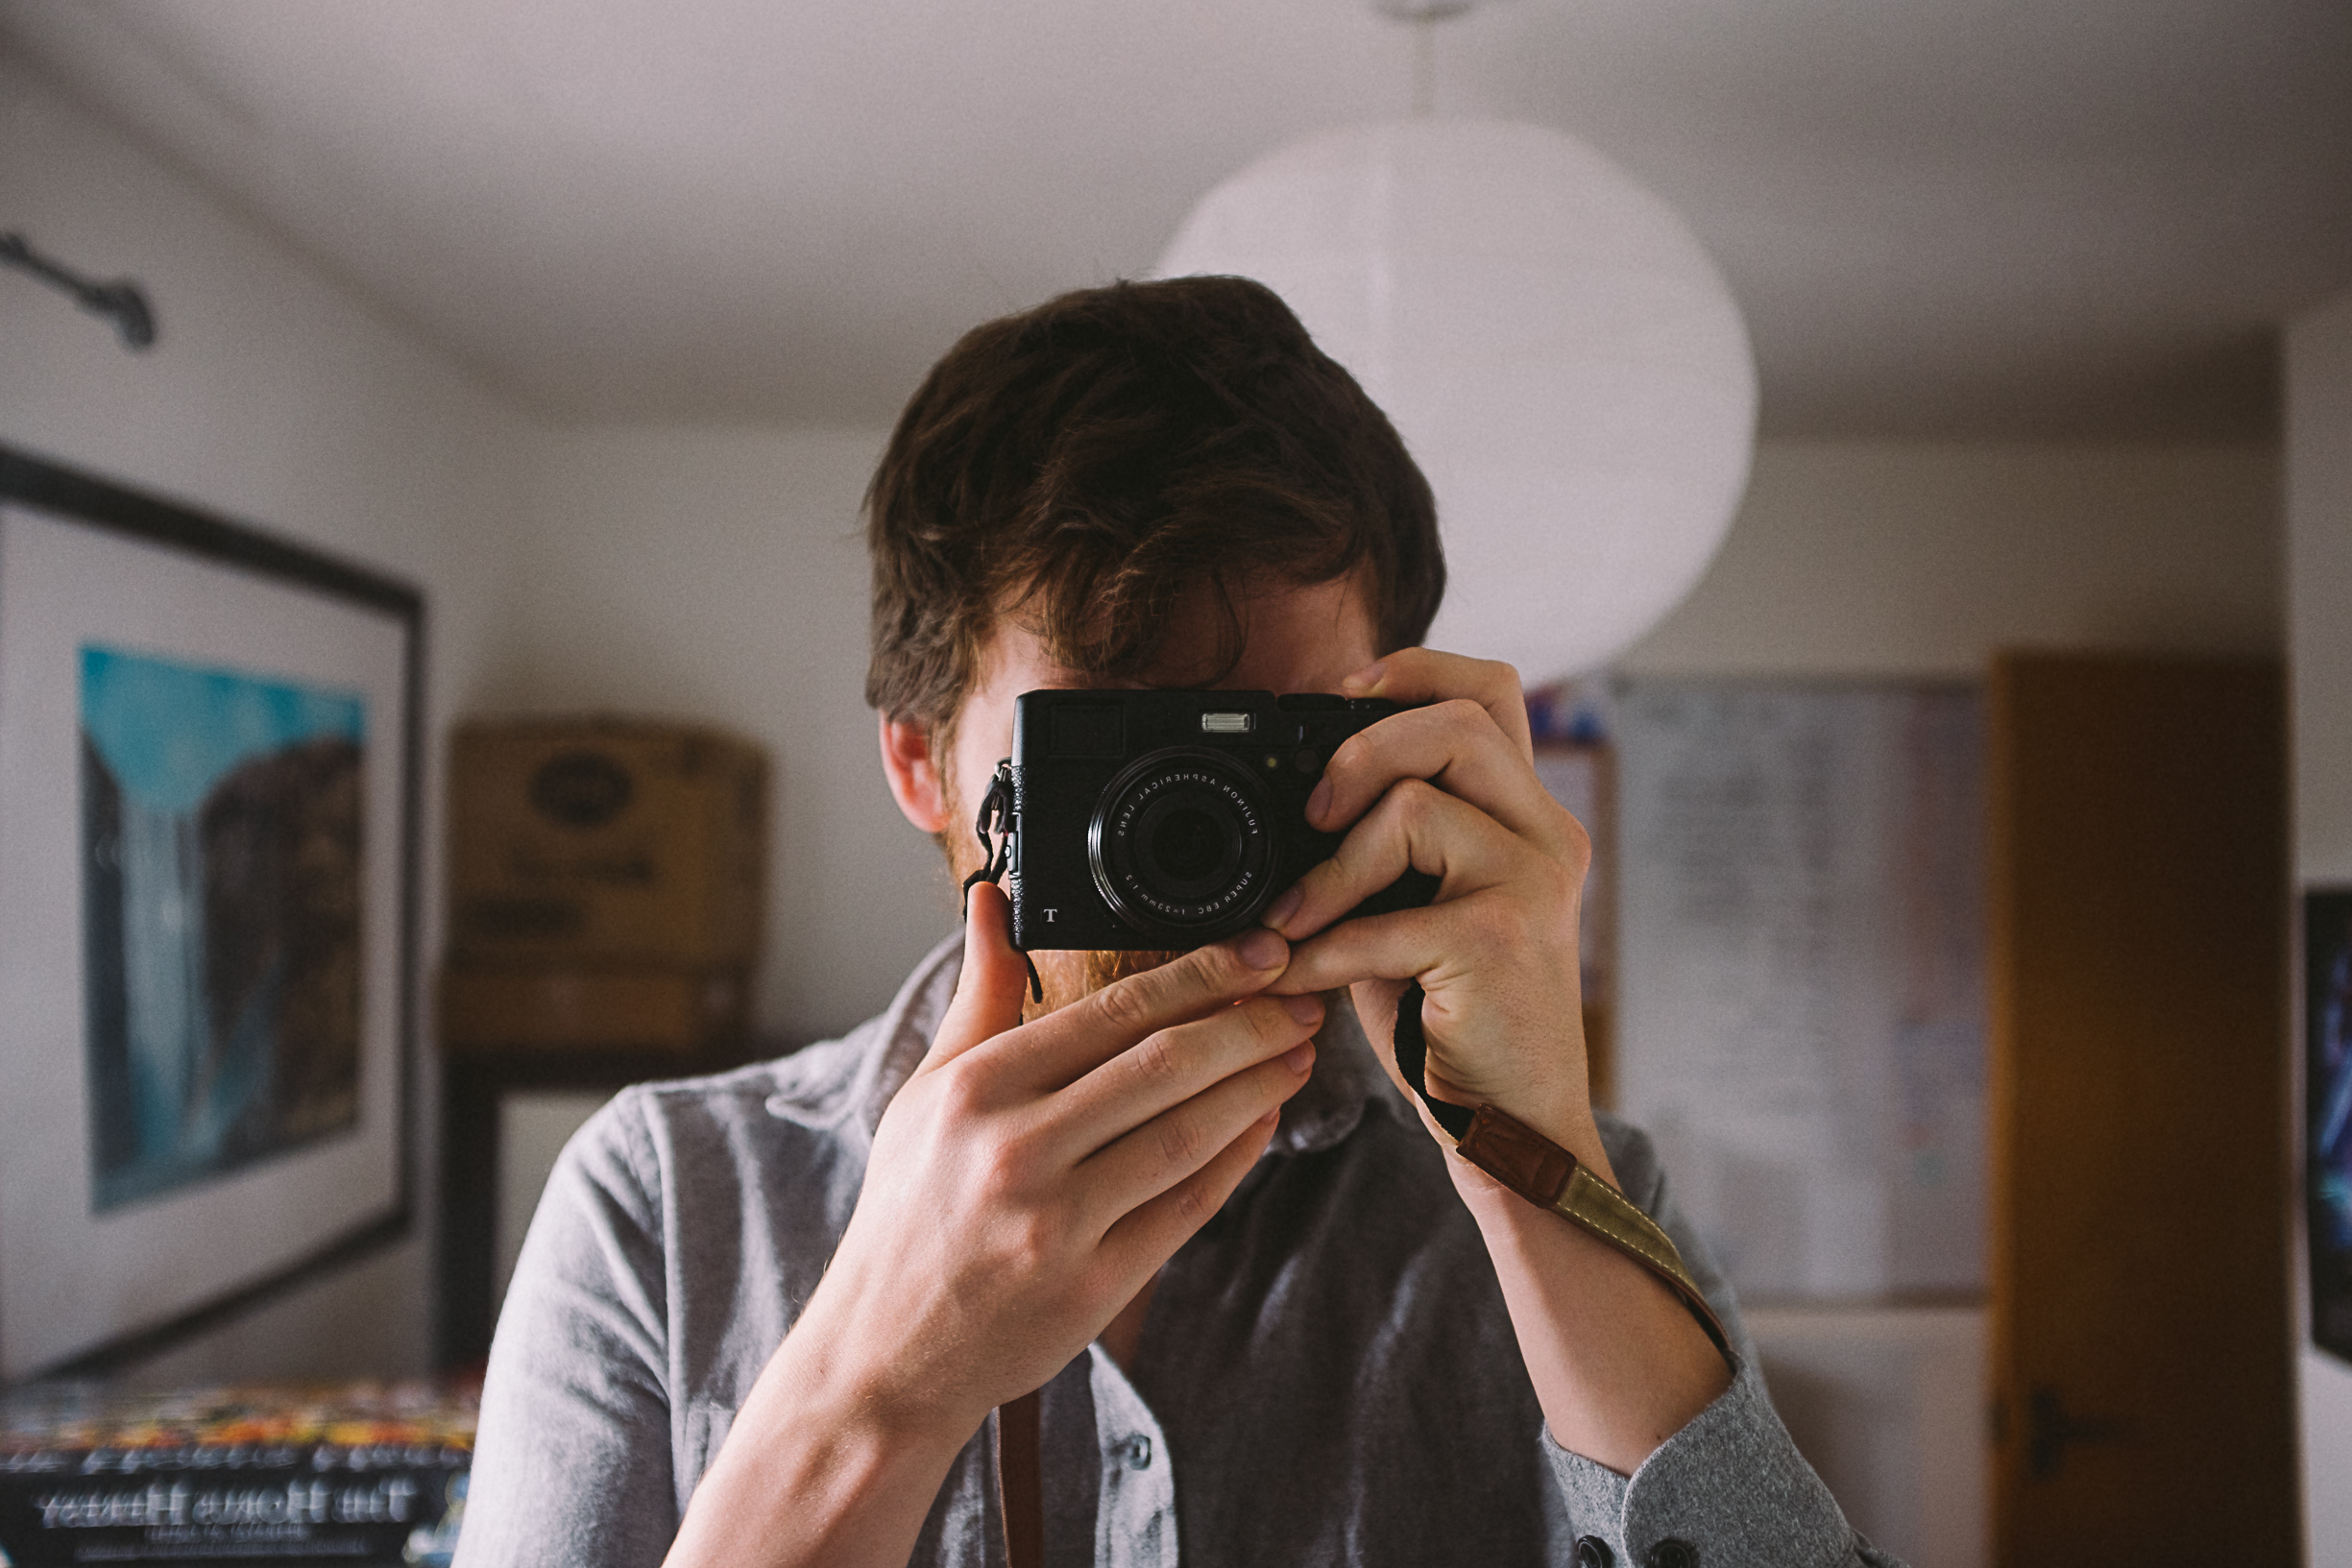 Obligatory mirror selfie.